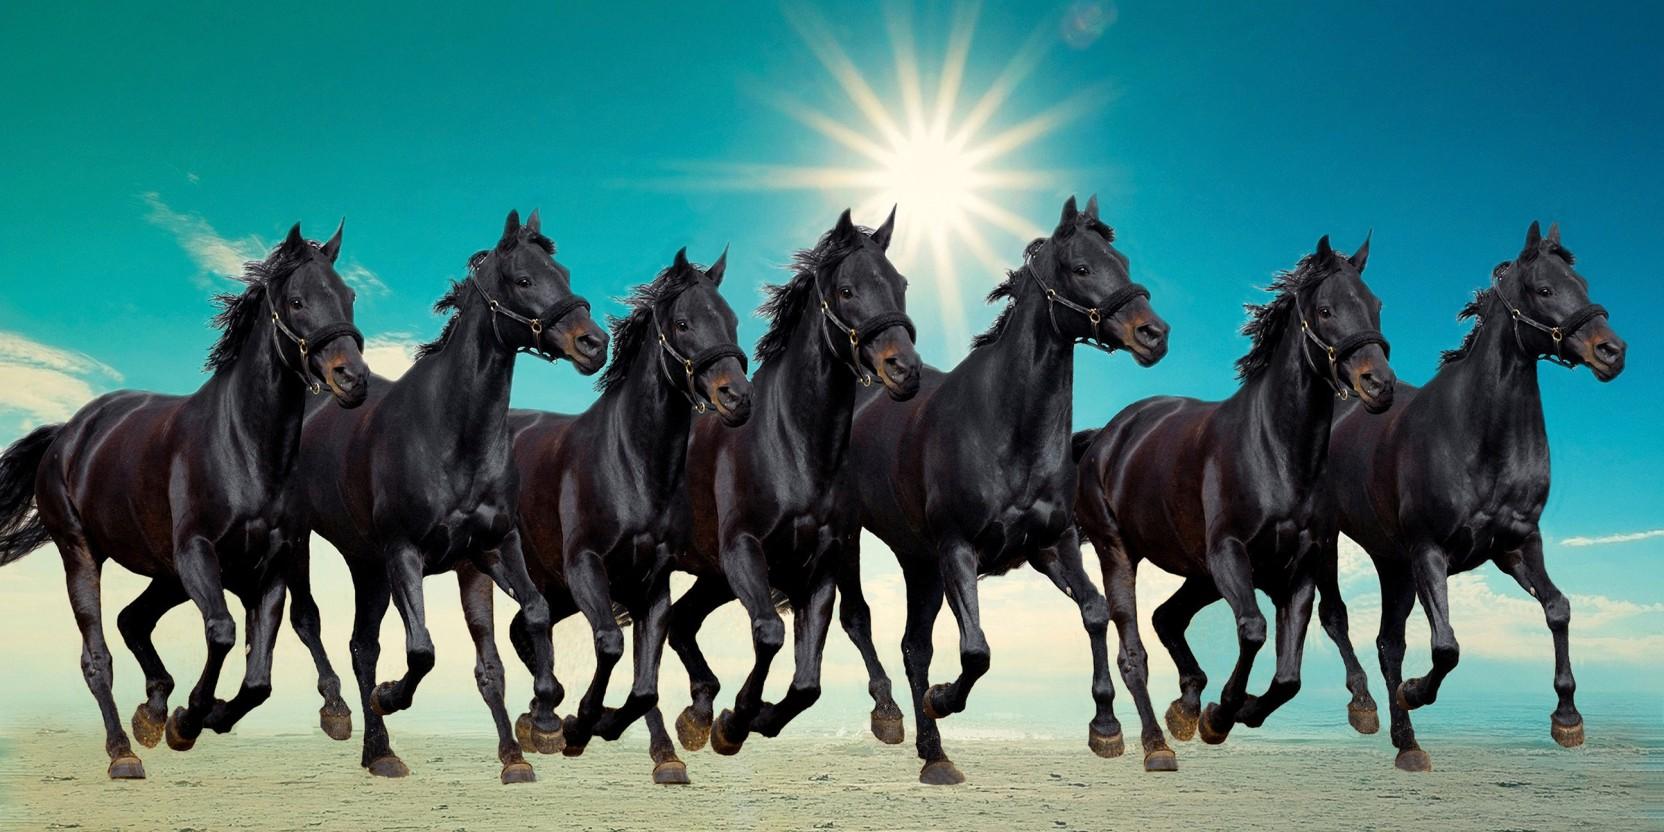 running horses painting according to vastu defendbigbirdcom